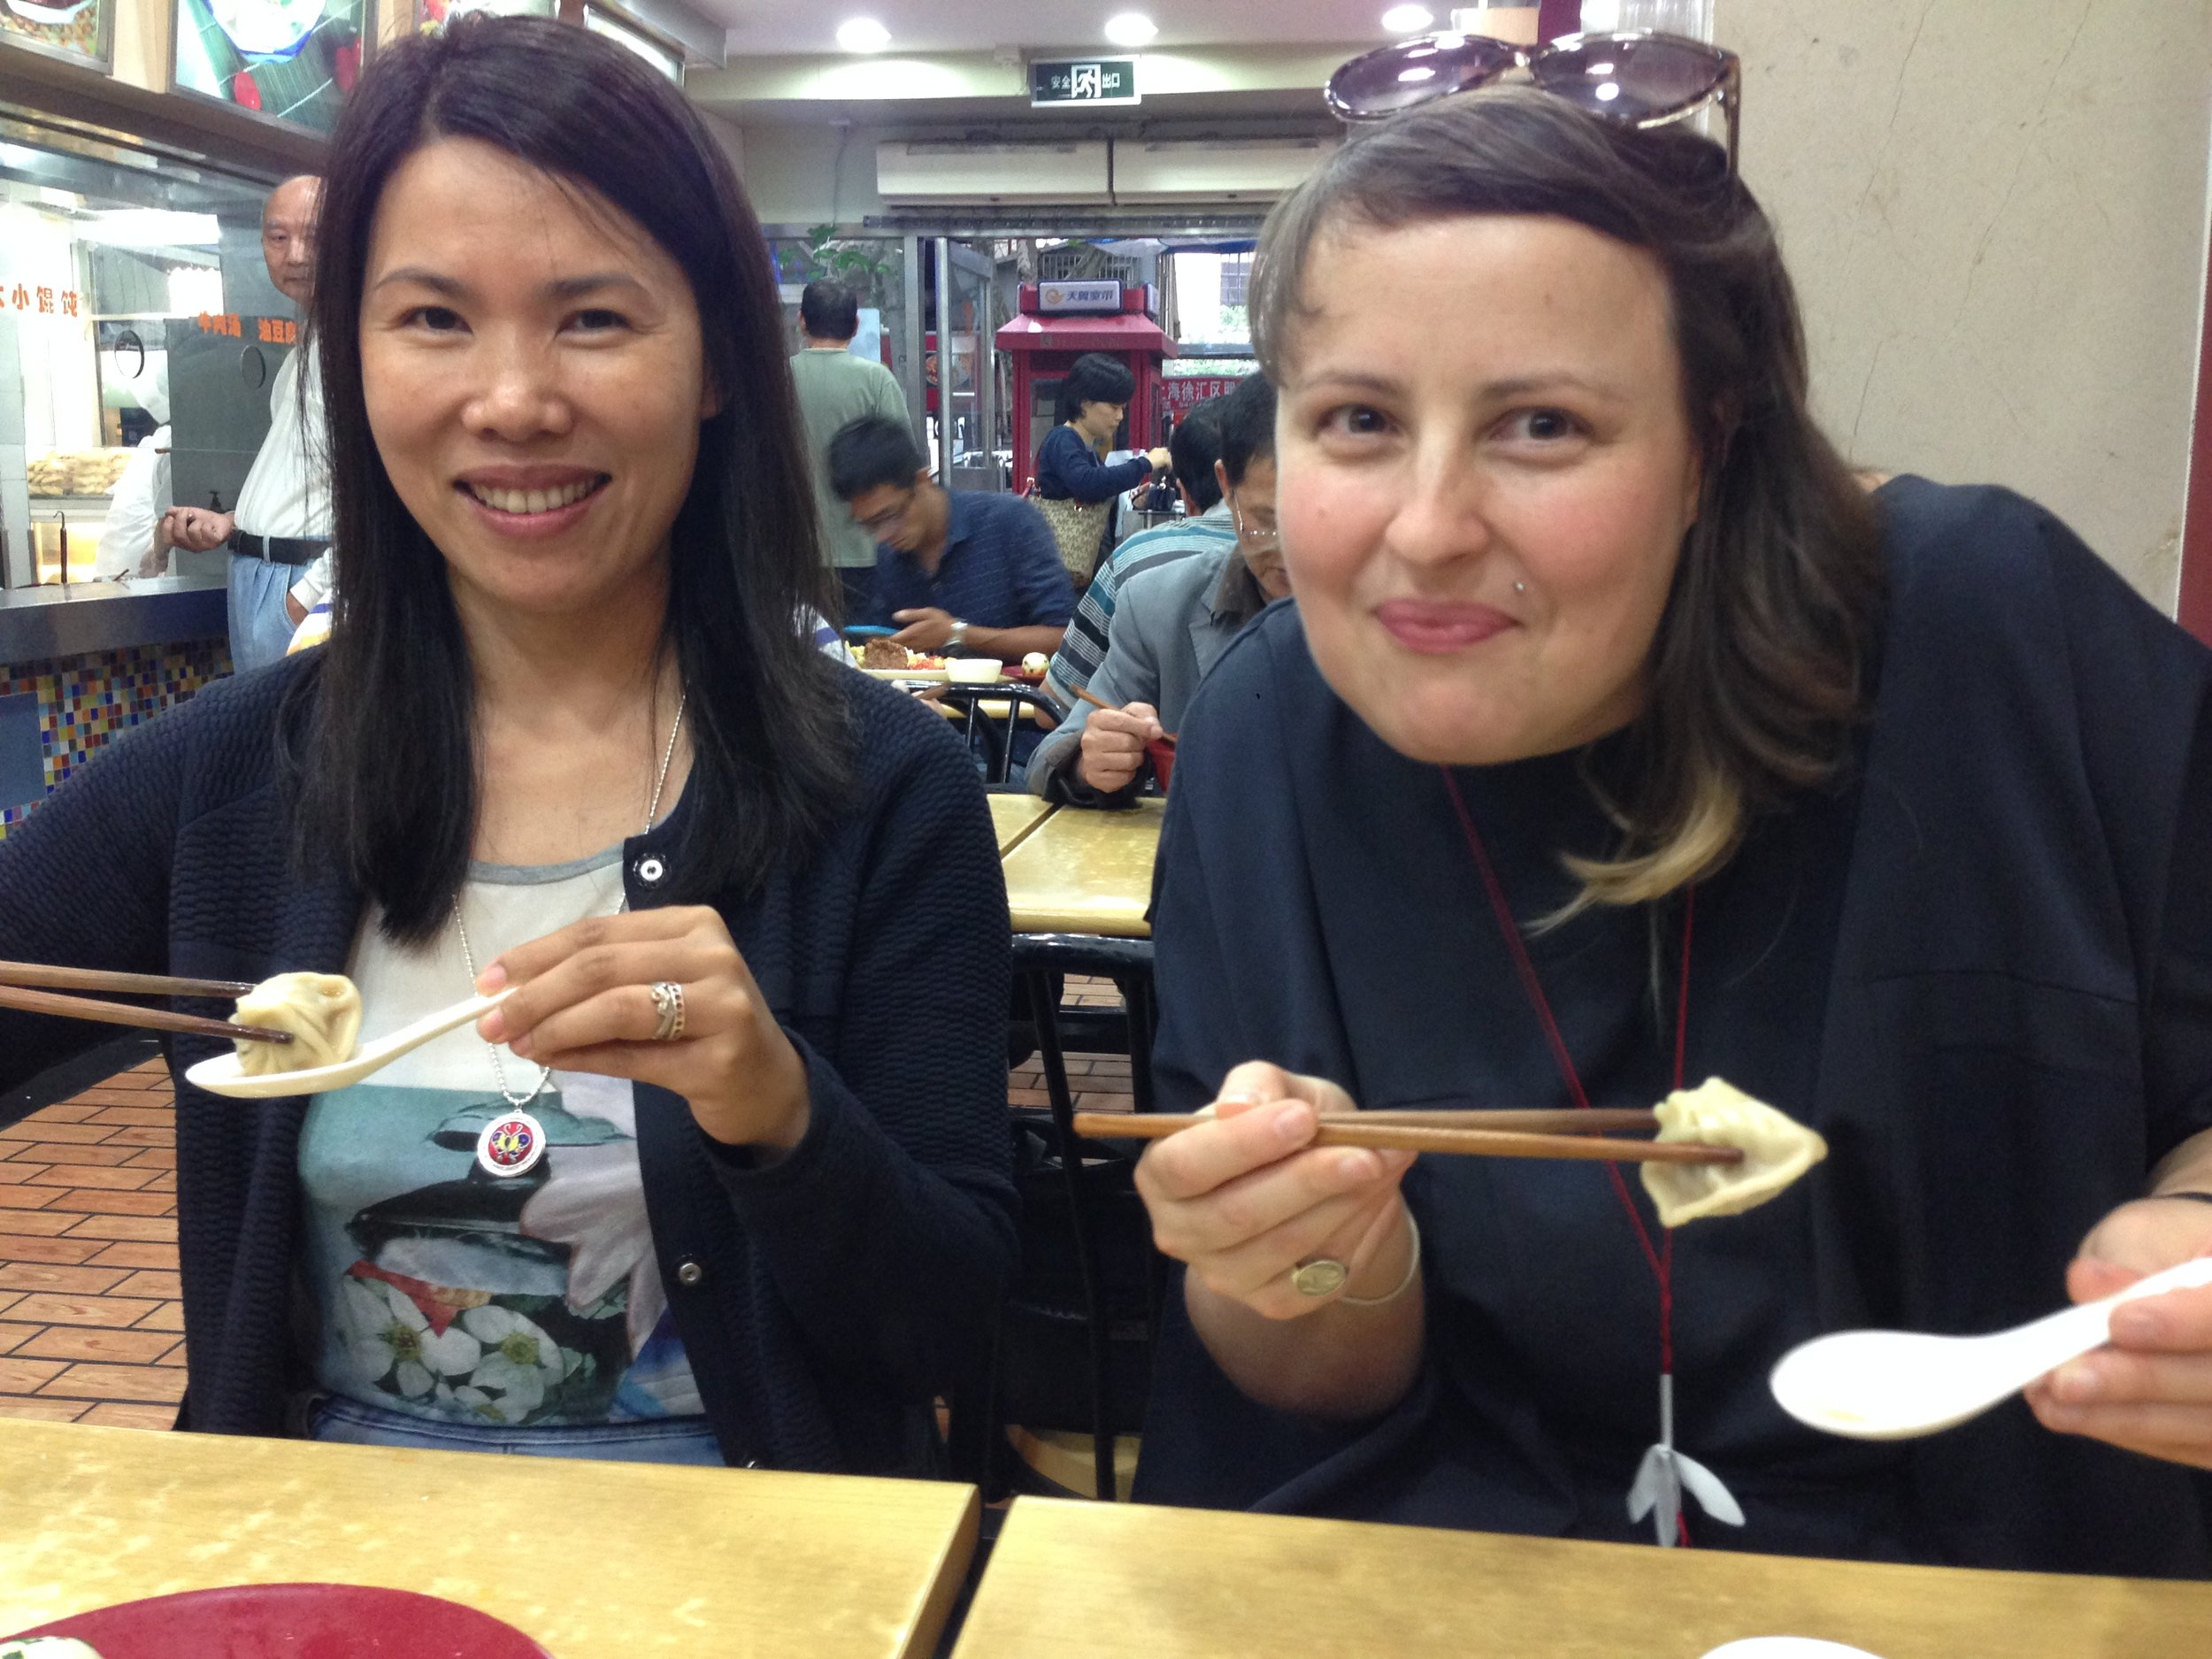 Yiwei and Jess enjoy yummy dumplings in Shanghai